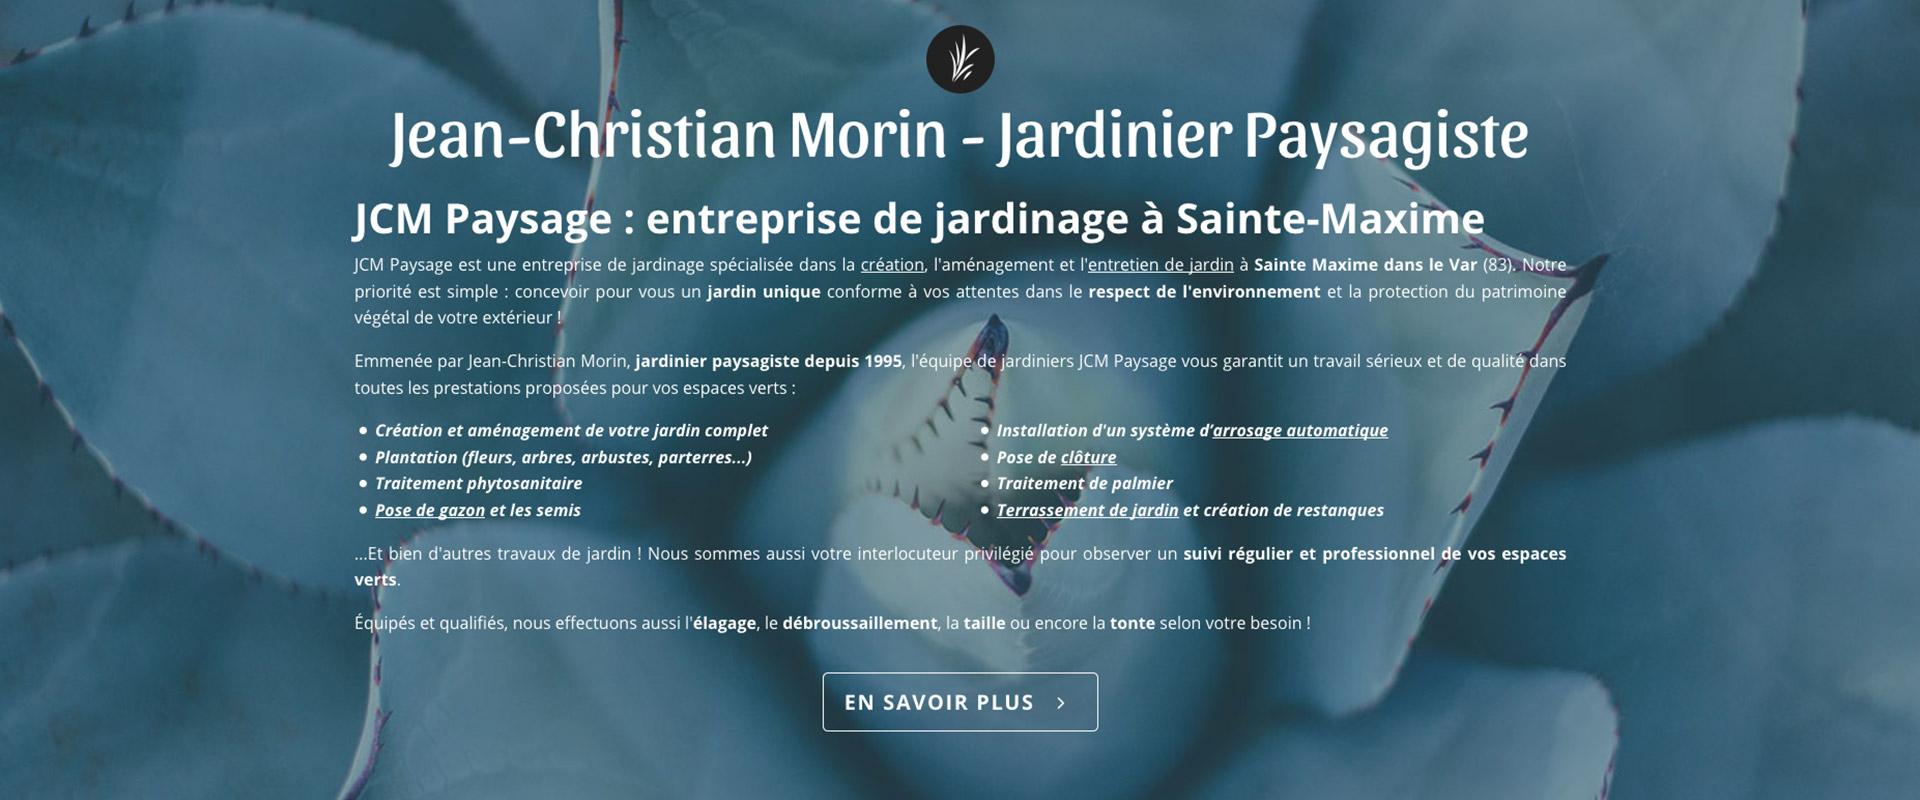 Webdesign présentation JCM paysage